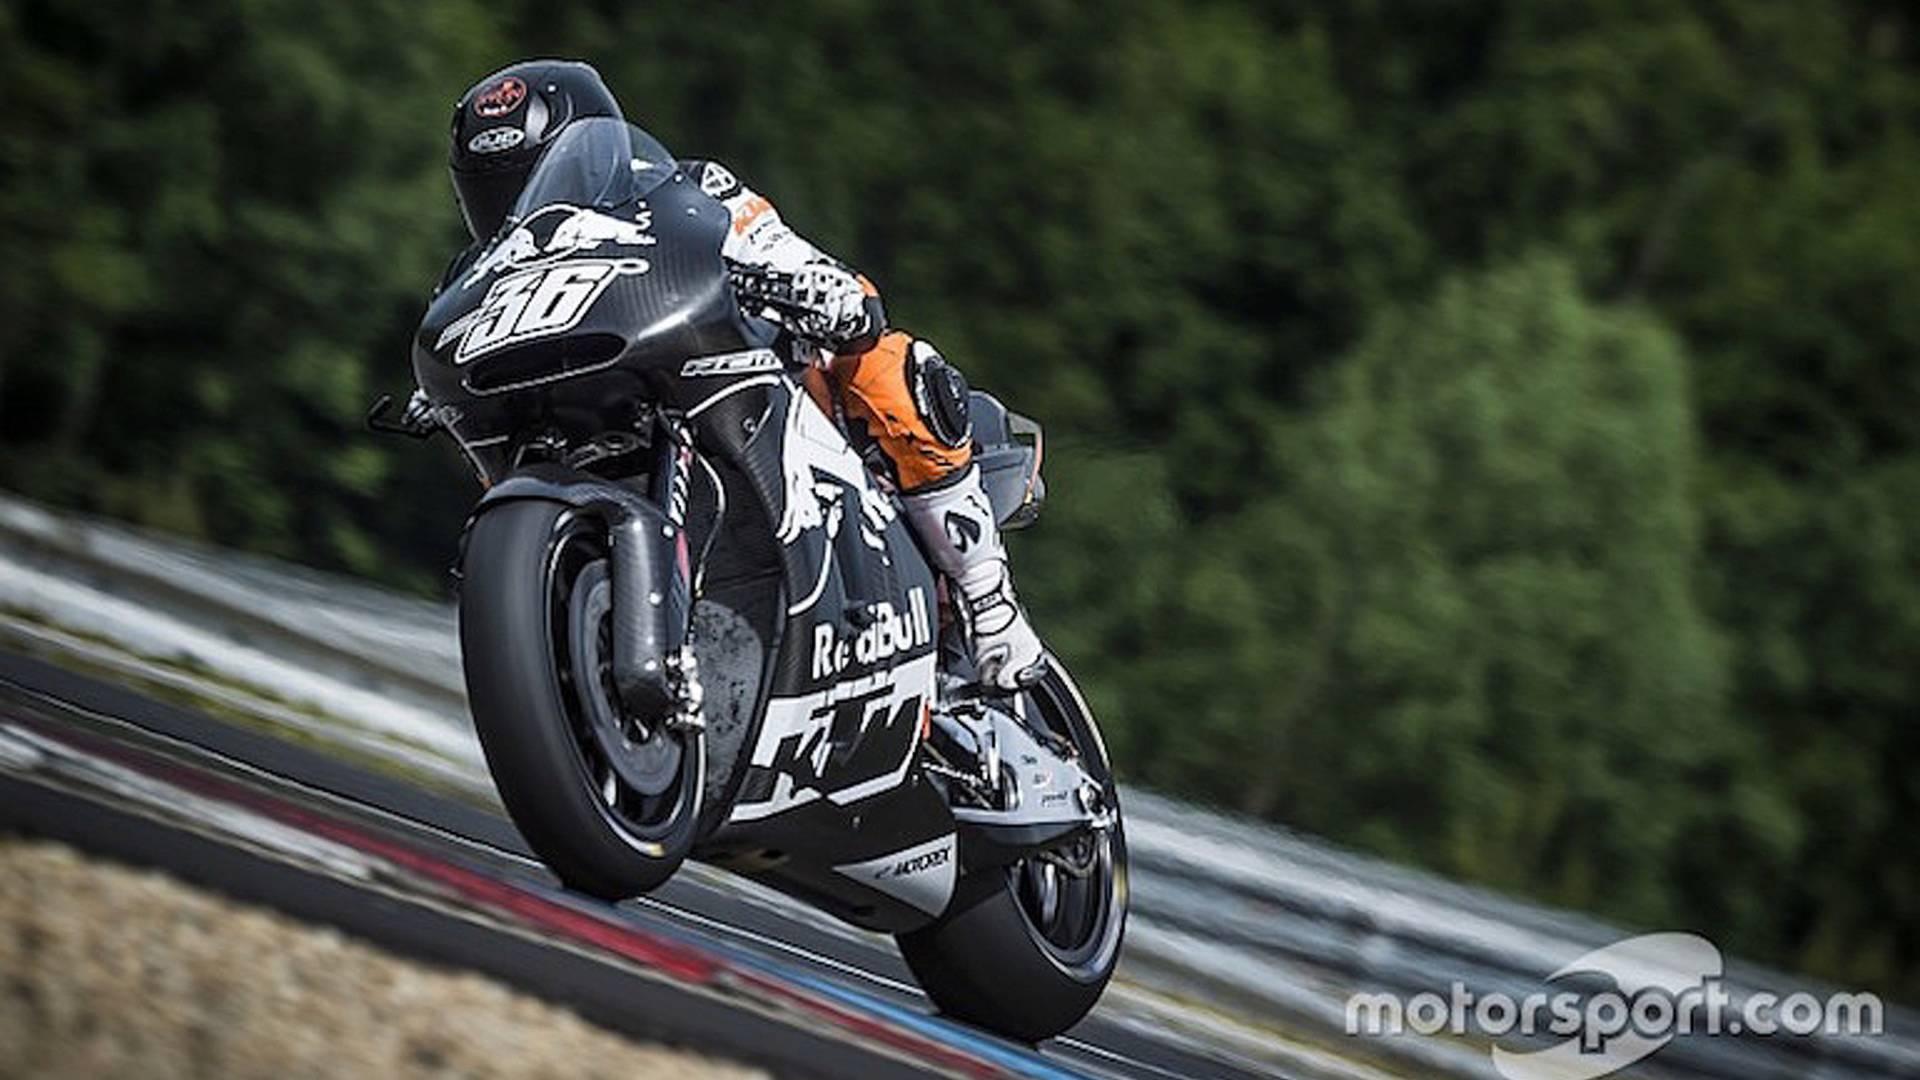 KTM Motorsport Confirms Cooperation with Tech3 in MotoGP